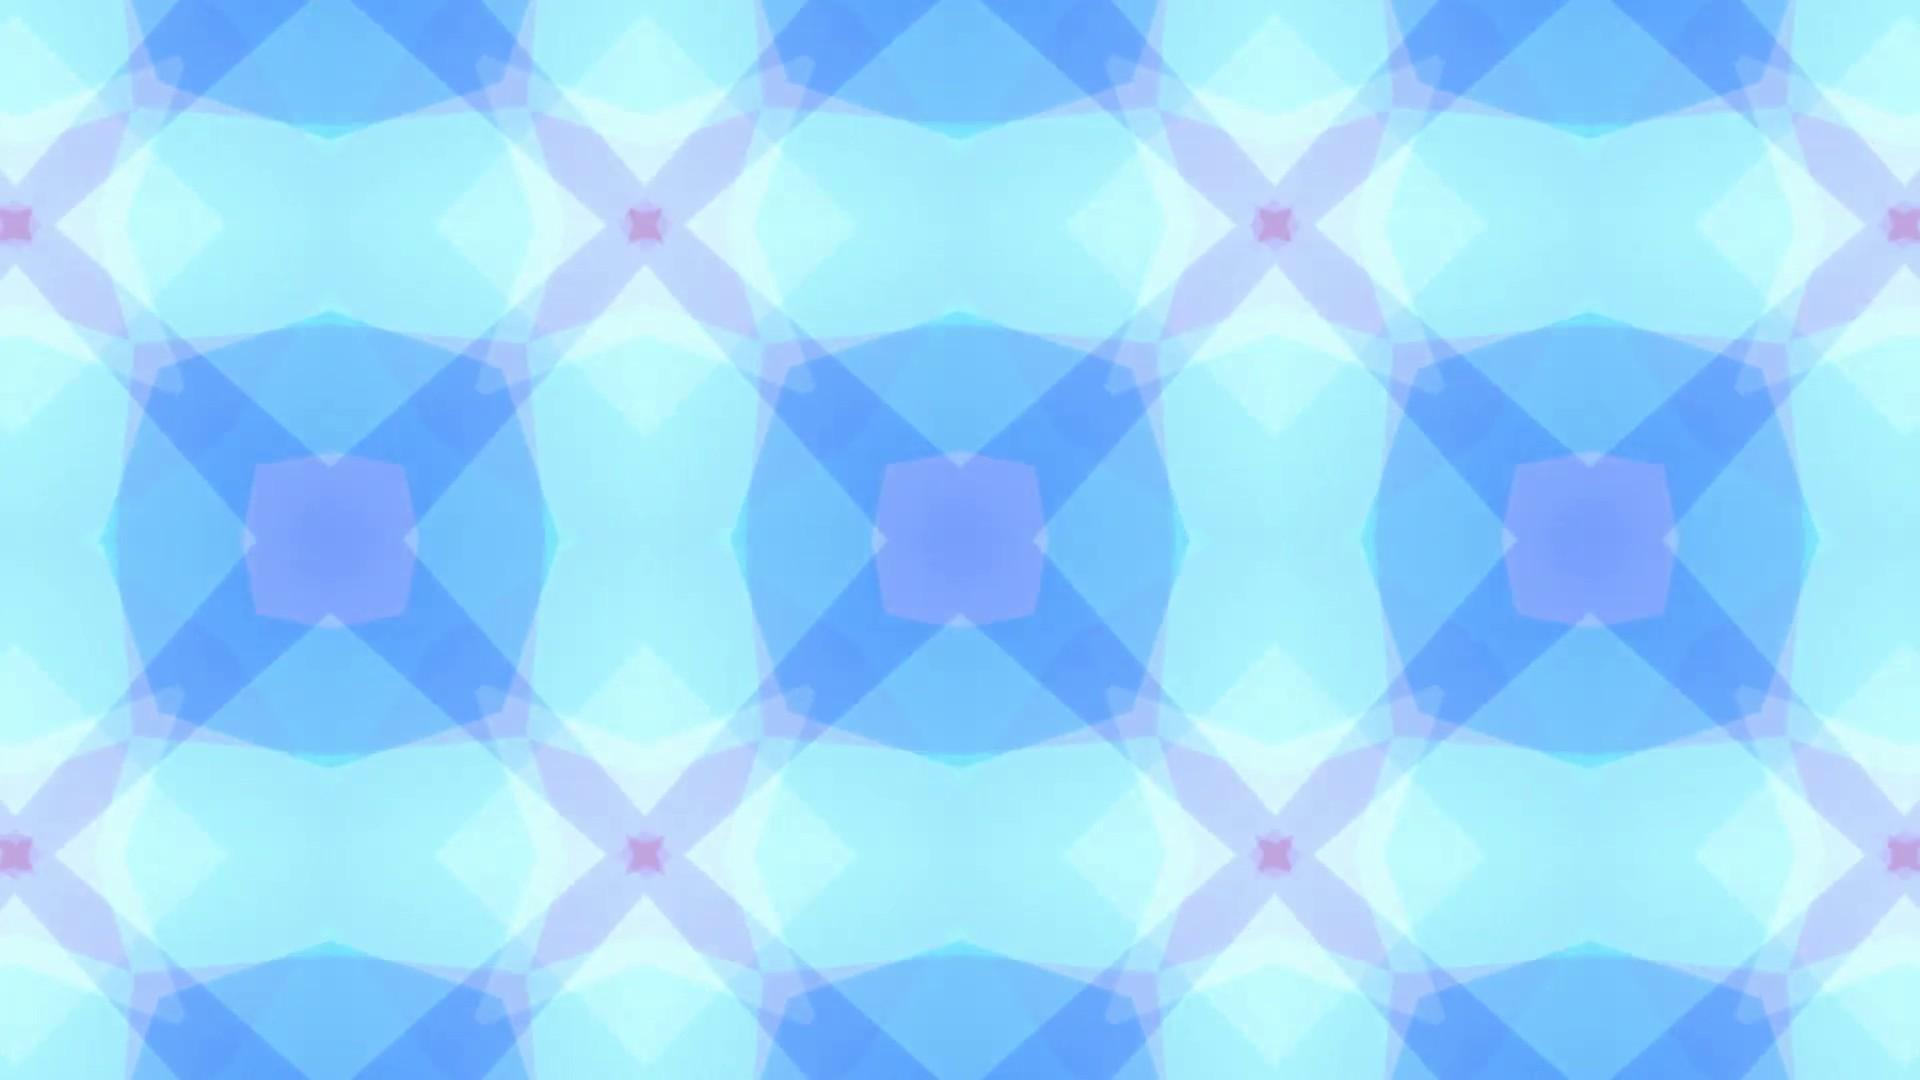 pastel blue background  u00b7 u2460 download free high resolution